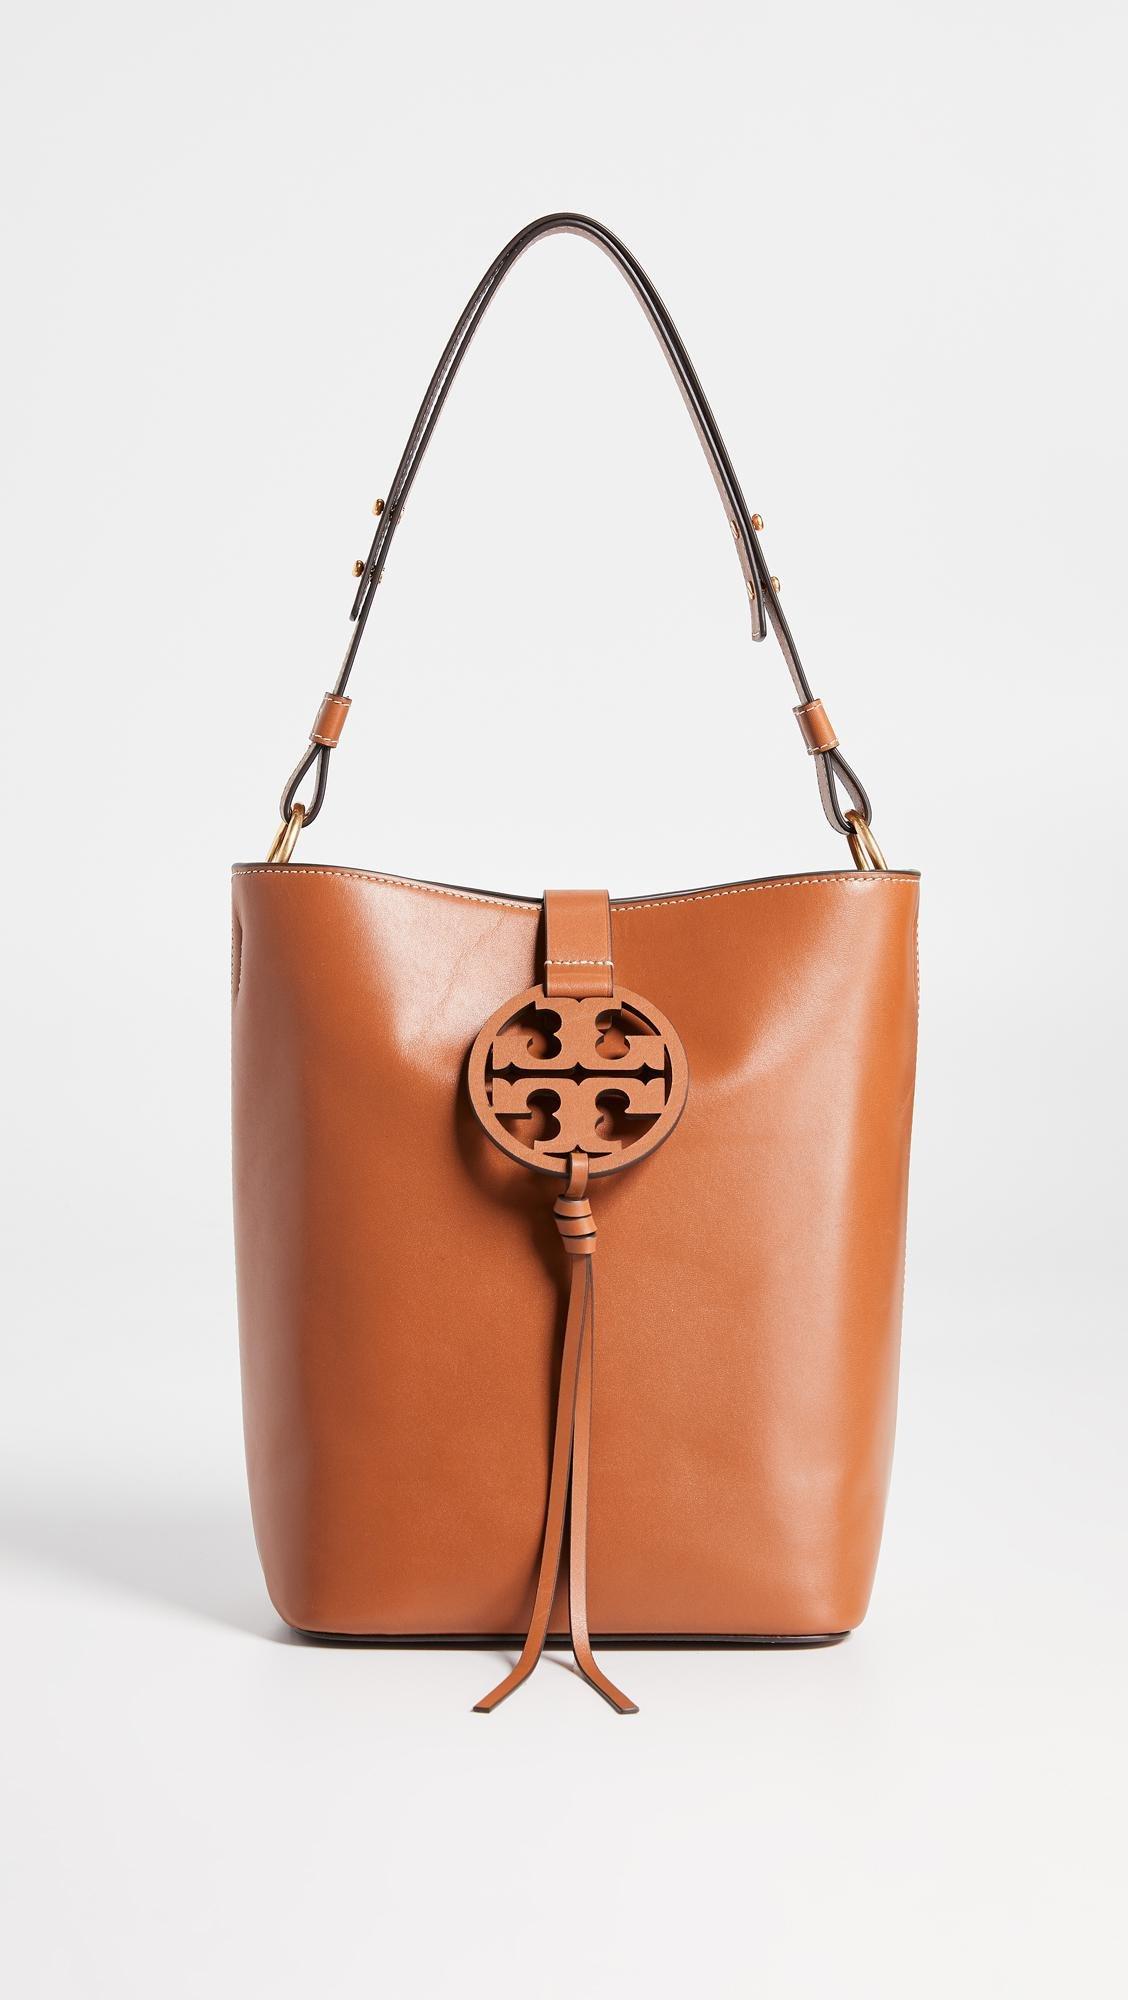 a6782f133e1a Lyst - Tory Burch Miller Hobo Bag in Brown